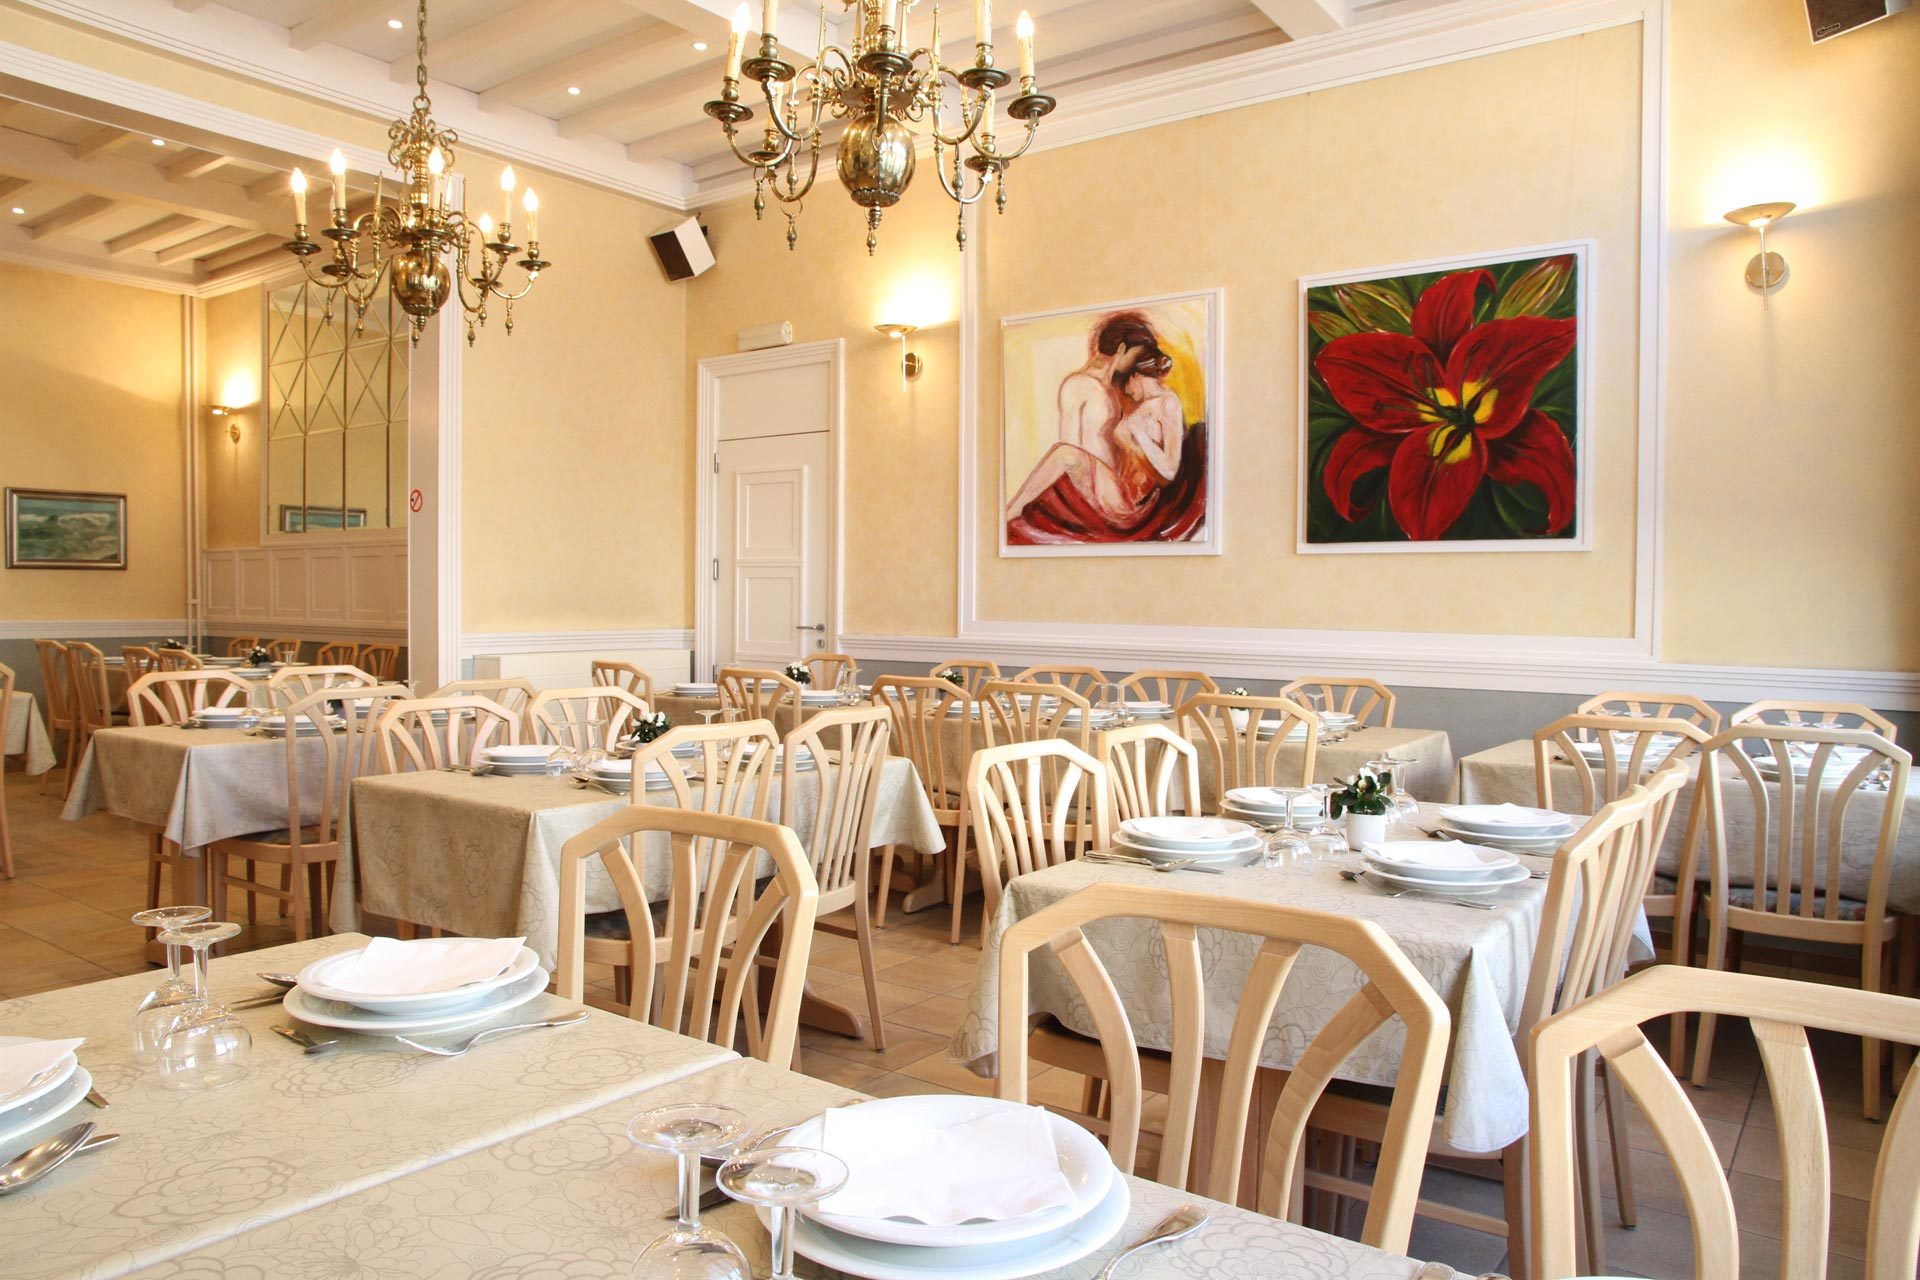 Restaurant - Sabot d'Or